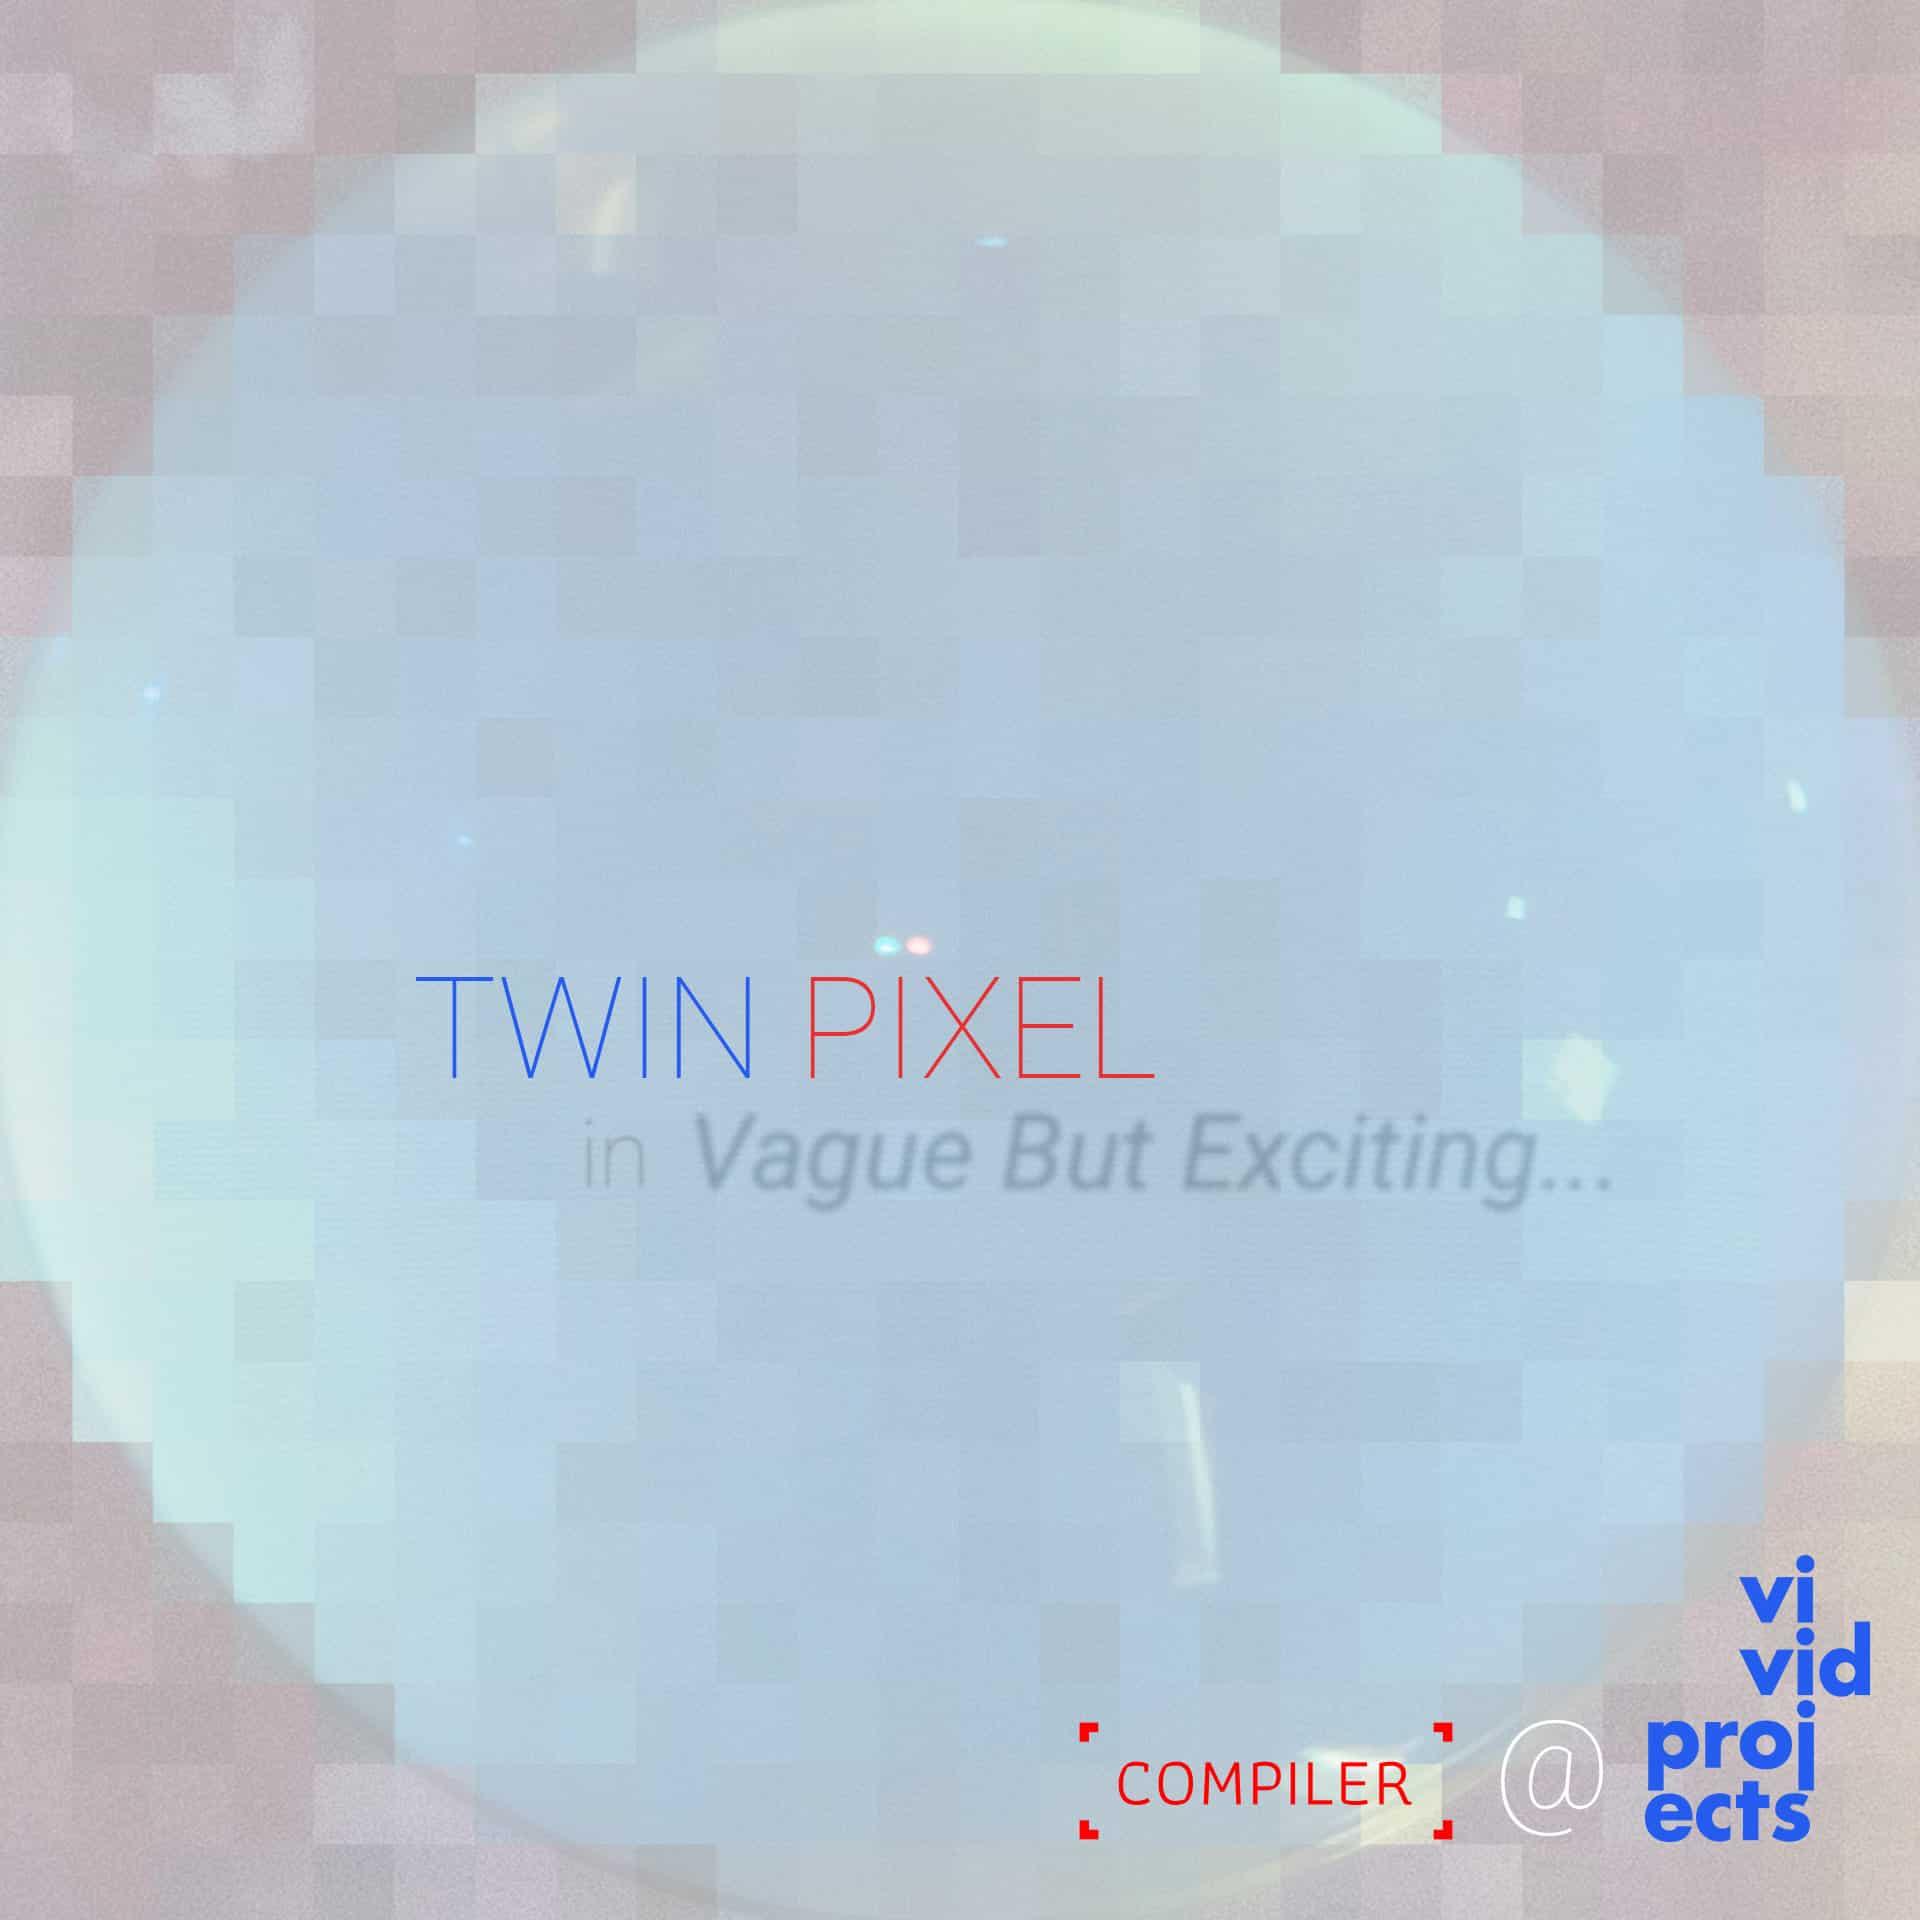 Twin Pixel @ Vivid Projects